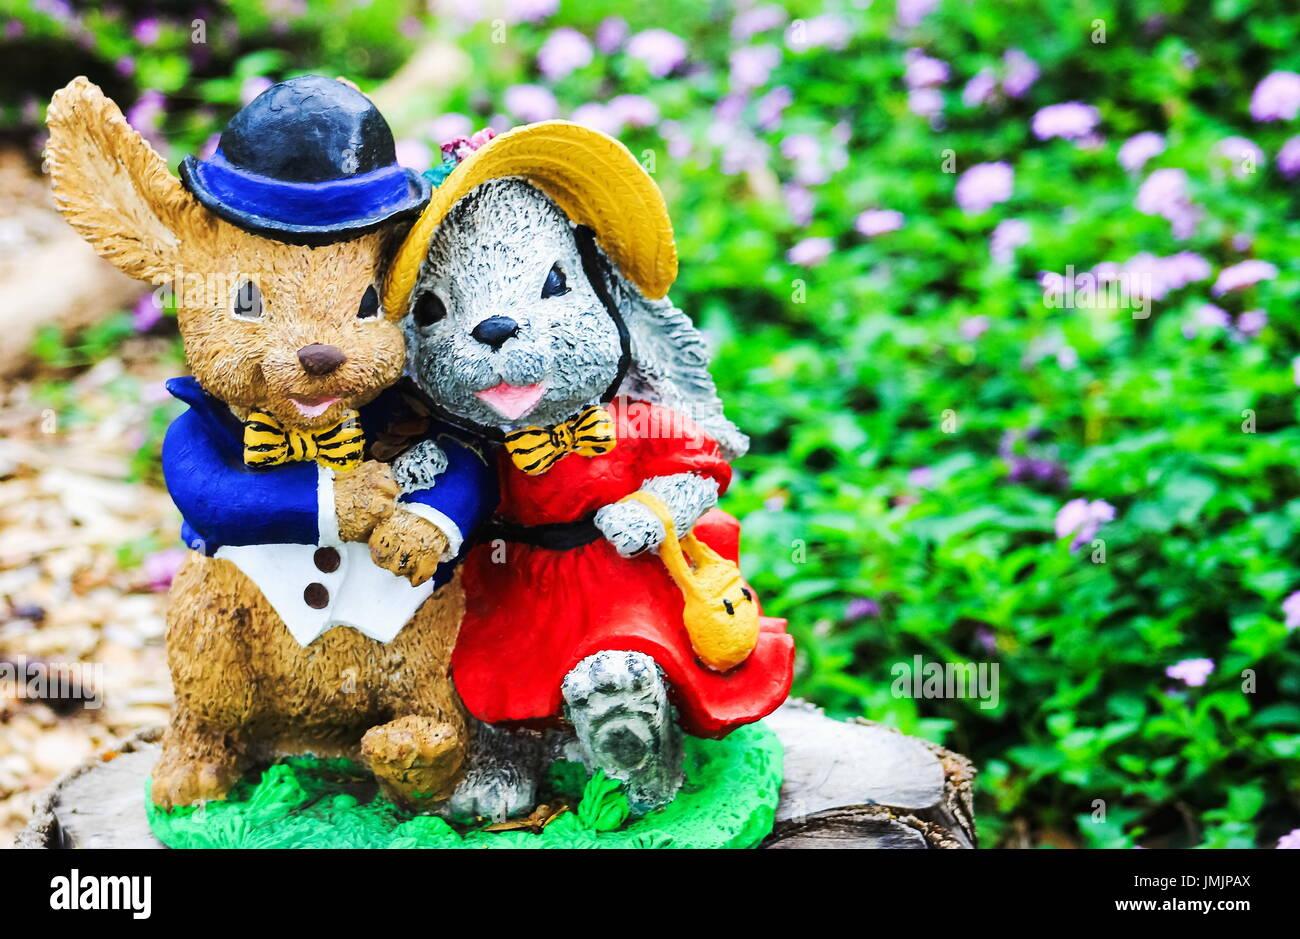 Herr und Frau Kaninchen Garten Ornament Stockbild